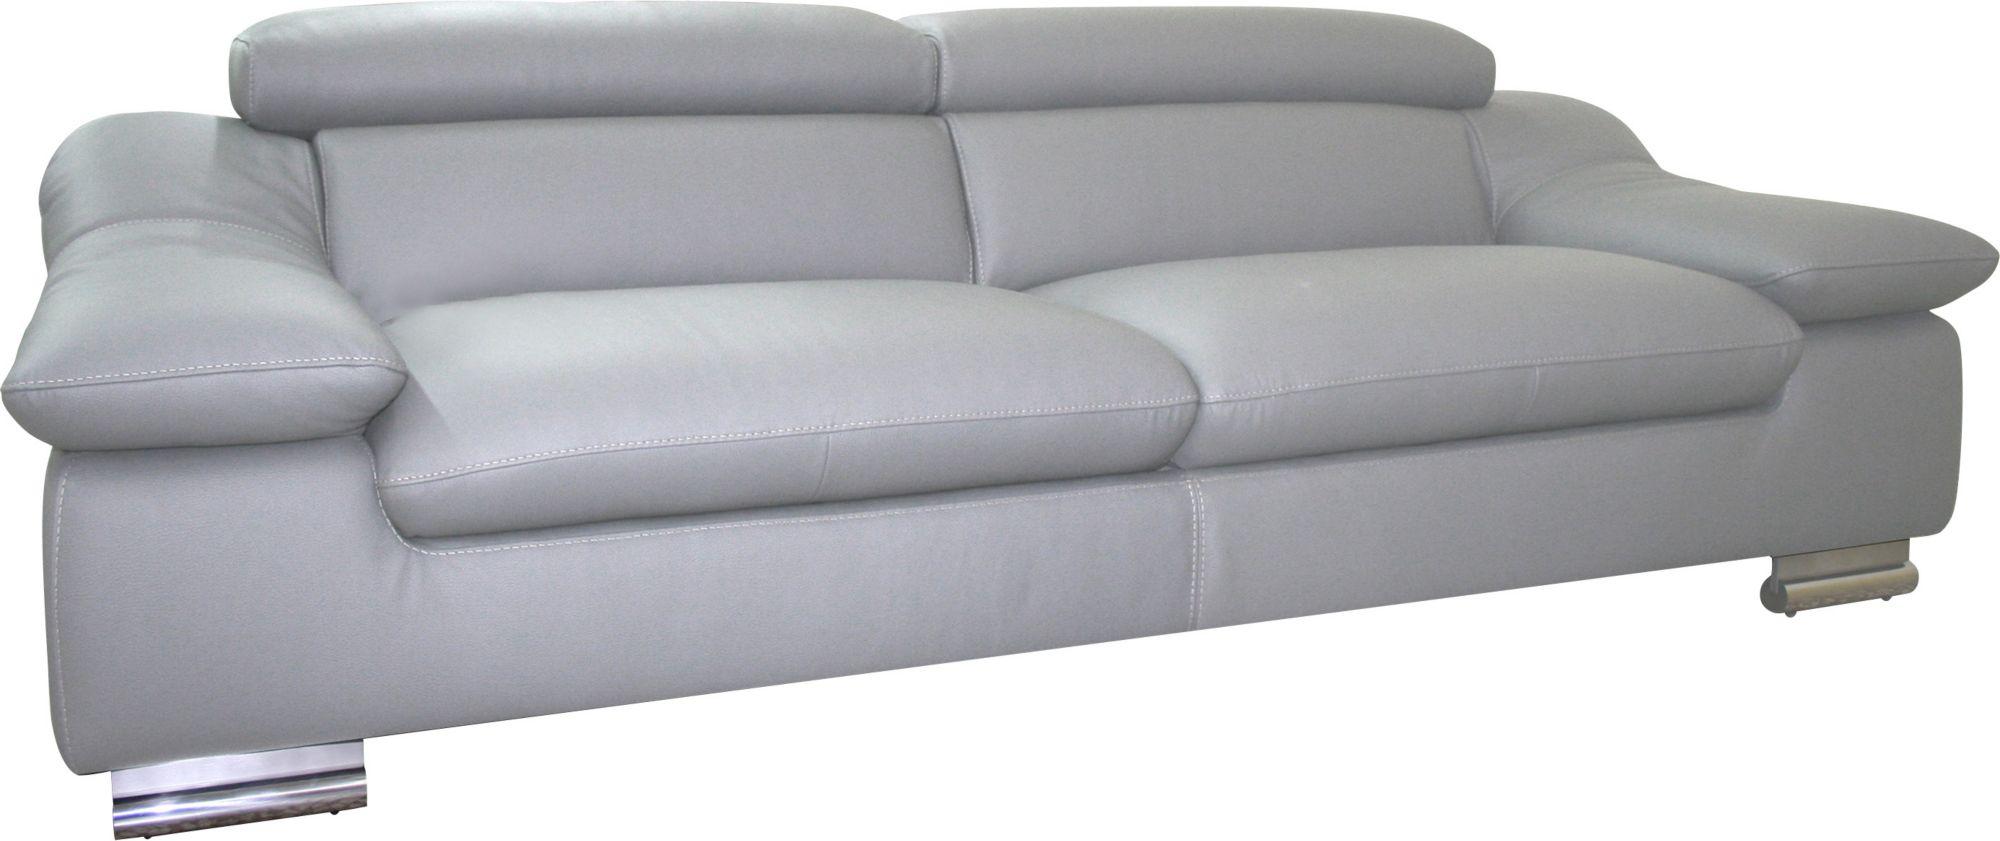 calia italia 3 sitzer ledersofa in zwei lederqualit ten schwab versand ecksofas. Black Bedroom Furniture Sets. Home Design Ideas